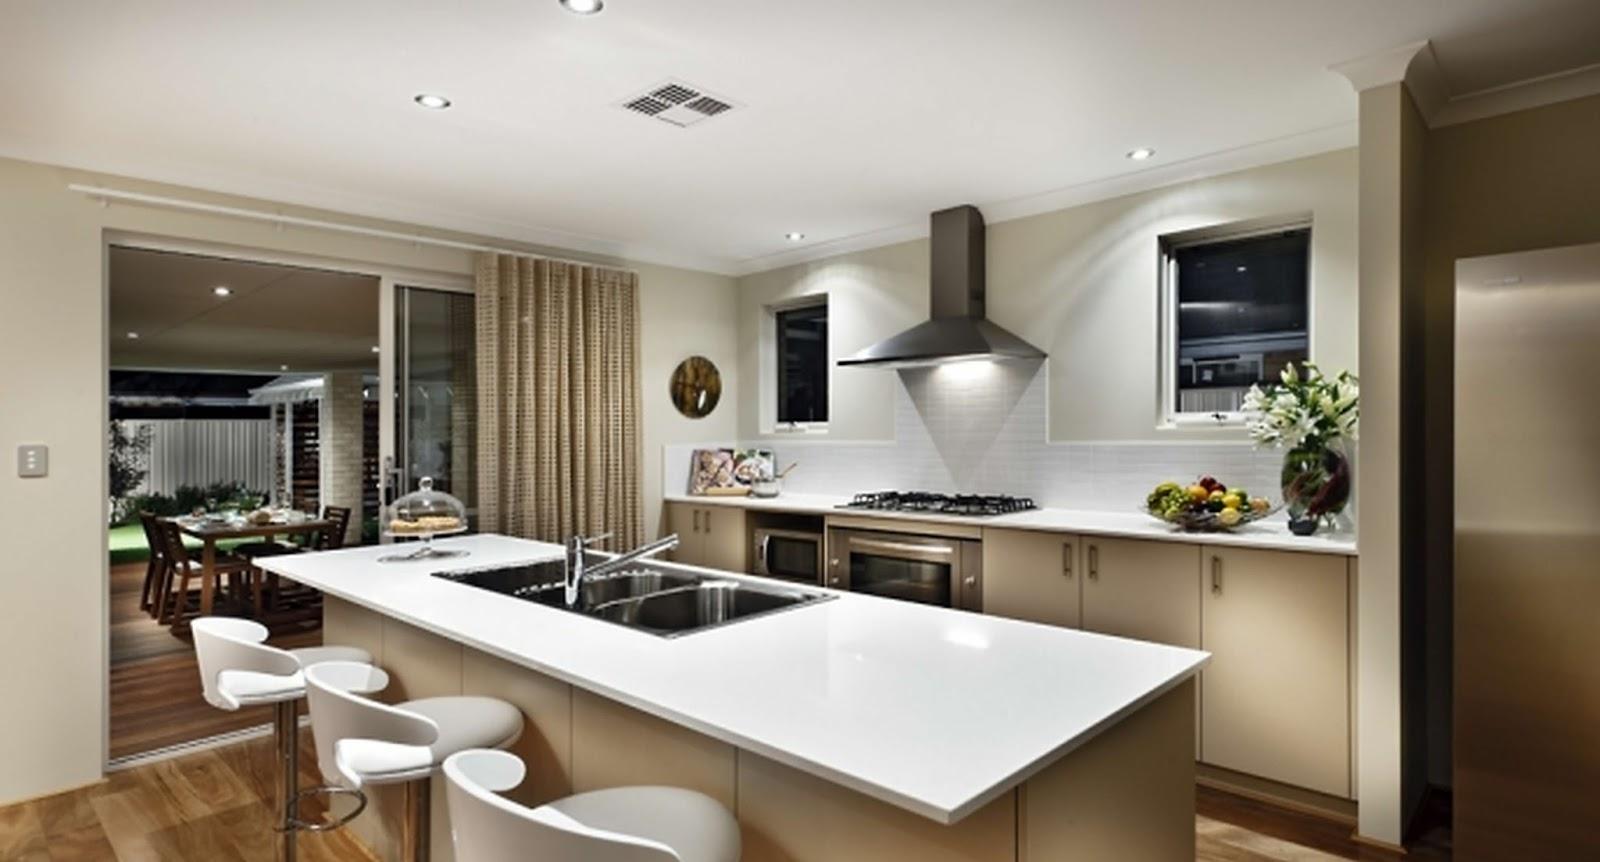 Uncategorized Design My Kitchen App design my kitchen app free layout ideas home cheap solution